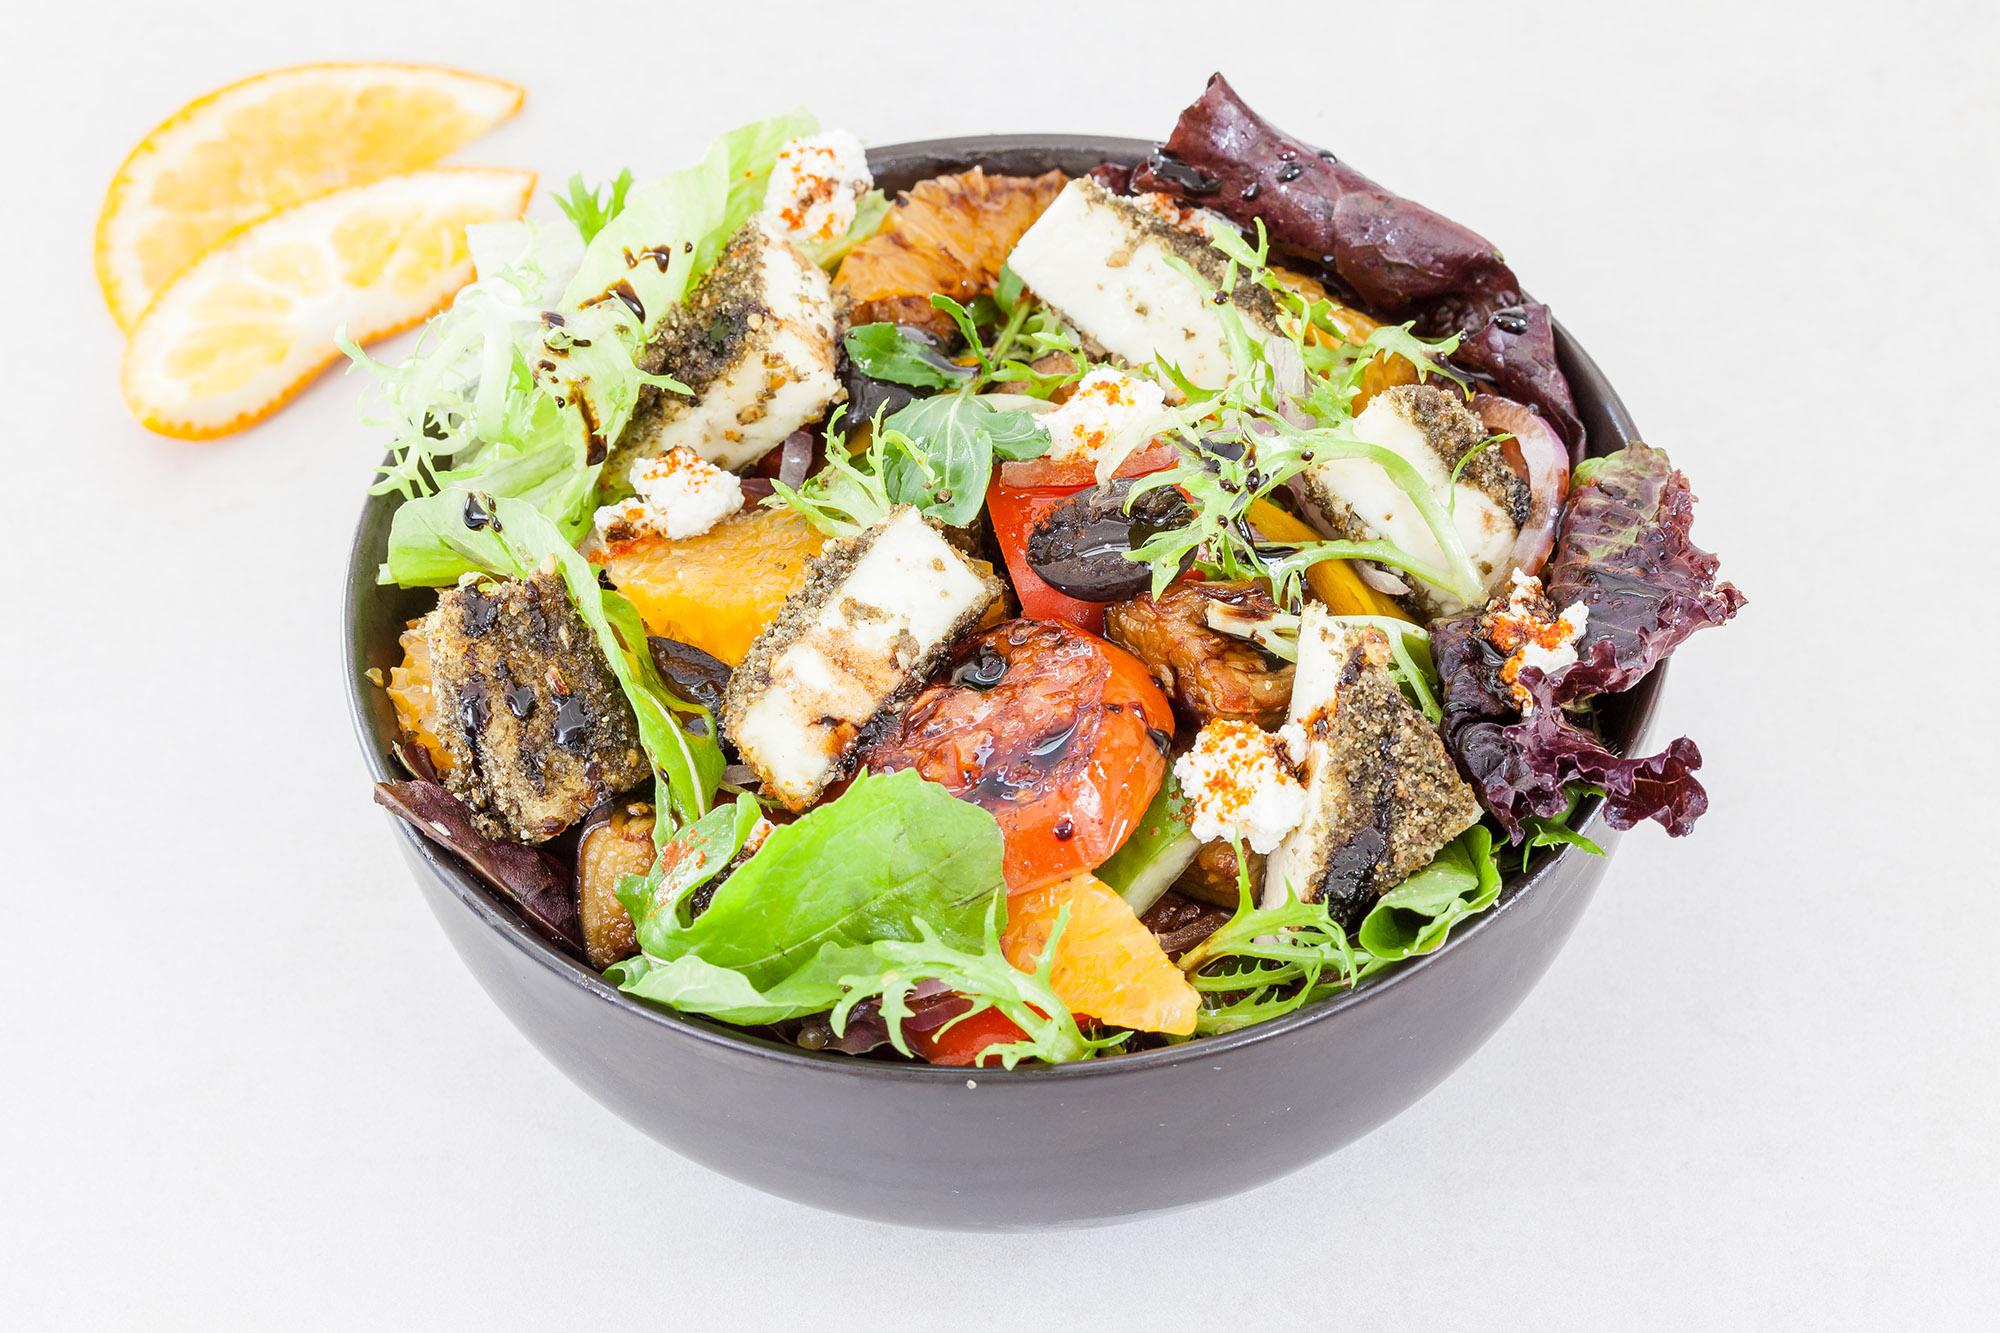 _16FM03272_Za'atar Crusted Cottage Cheese Salad - 365 kcal (Veg).jpg